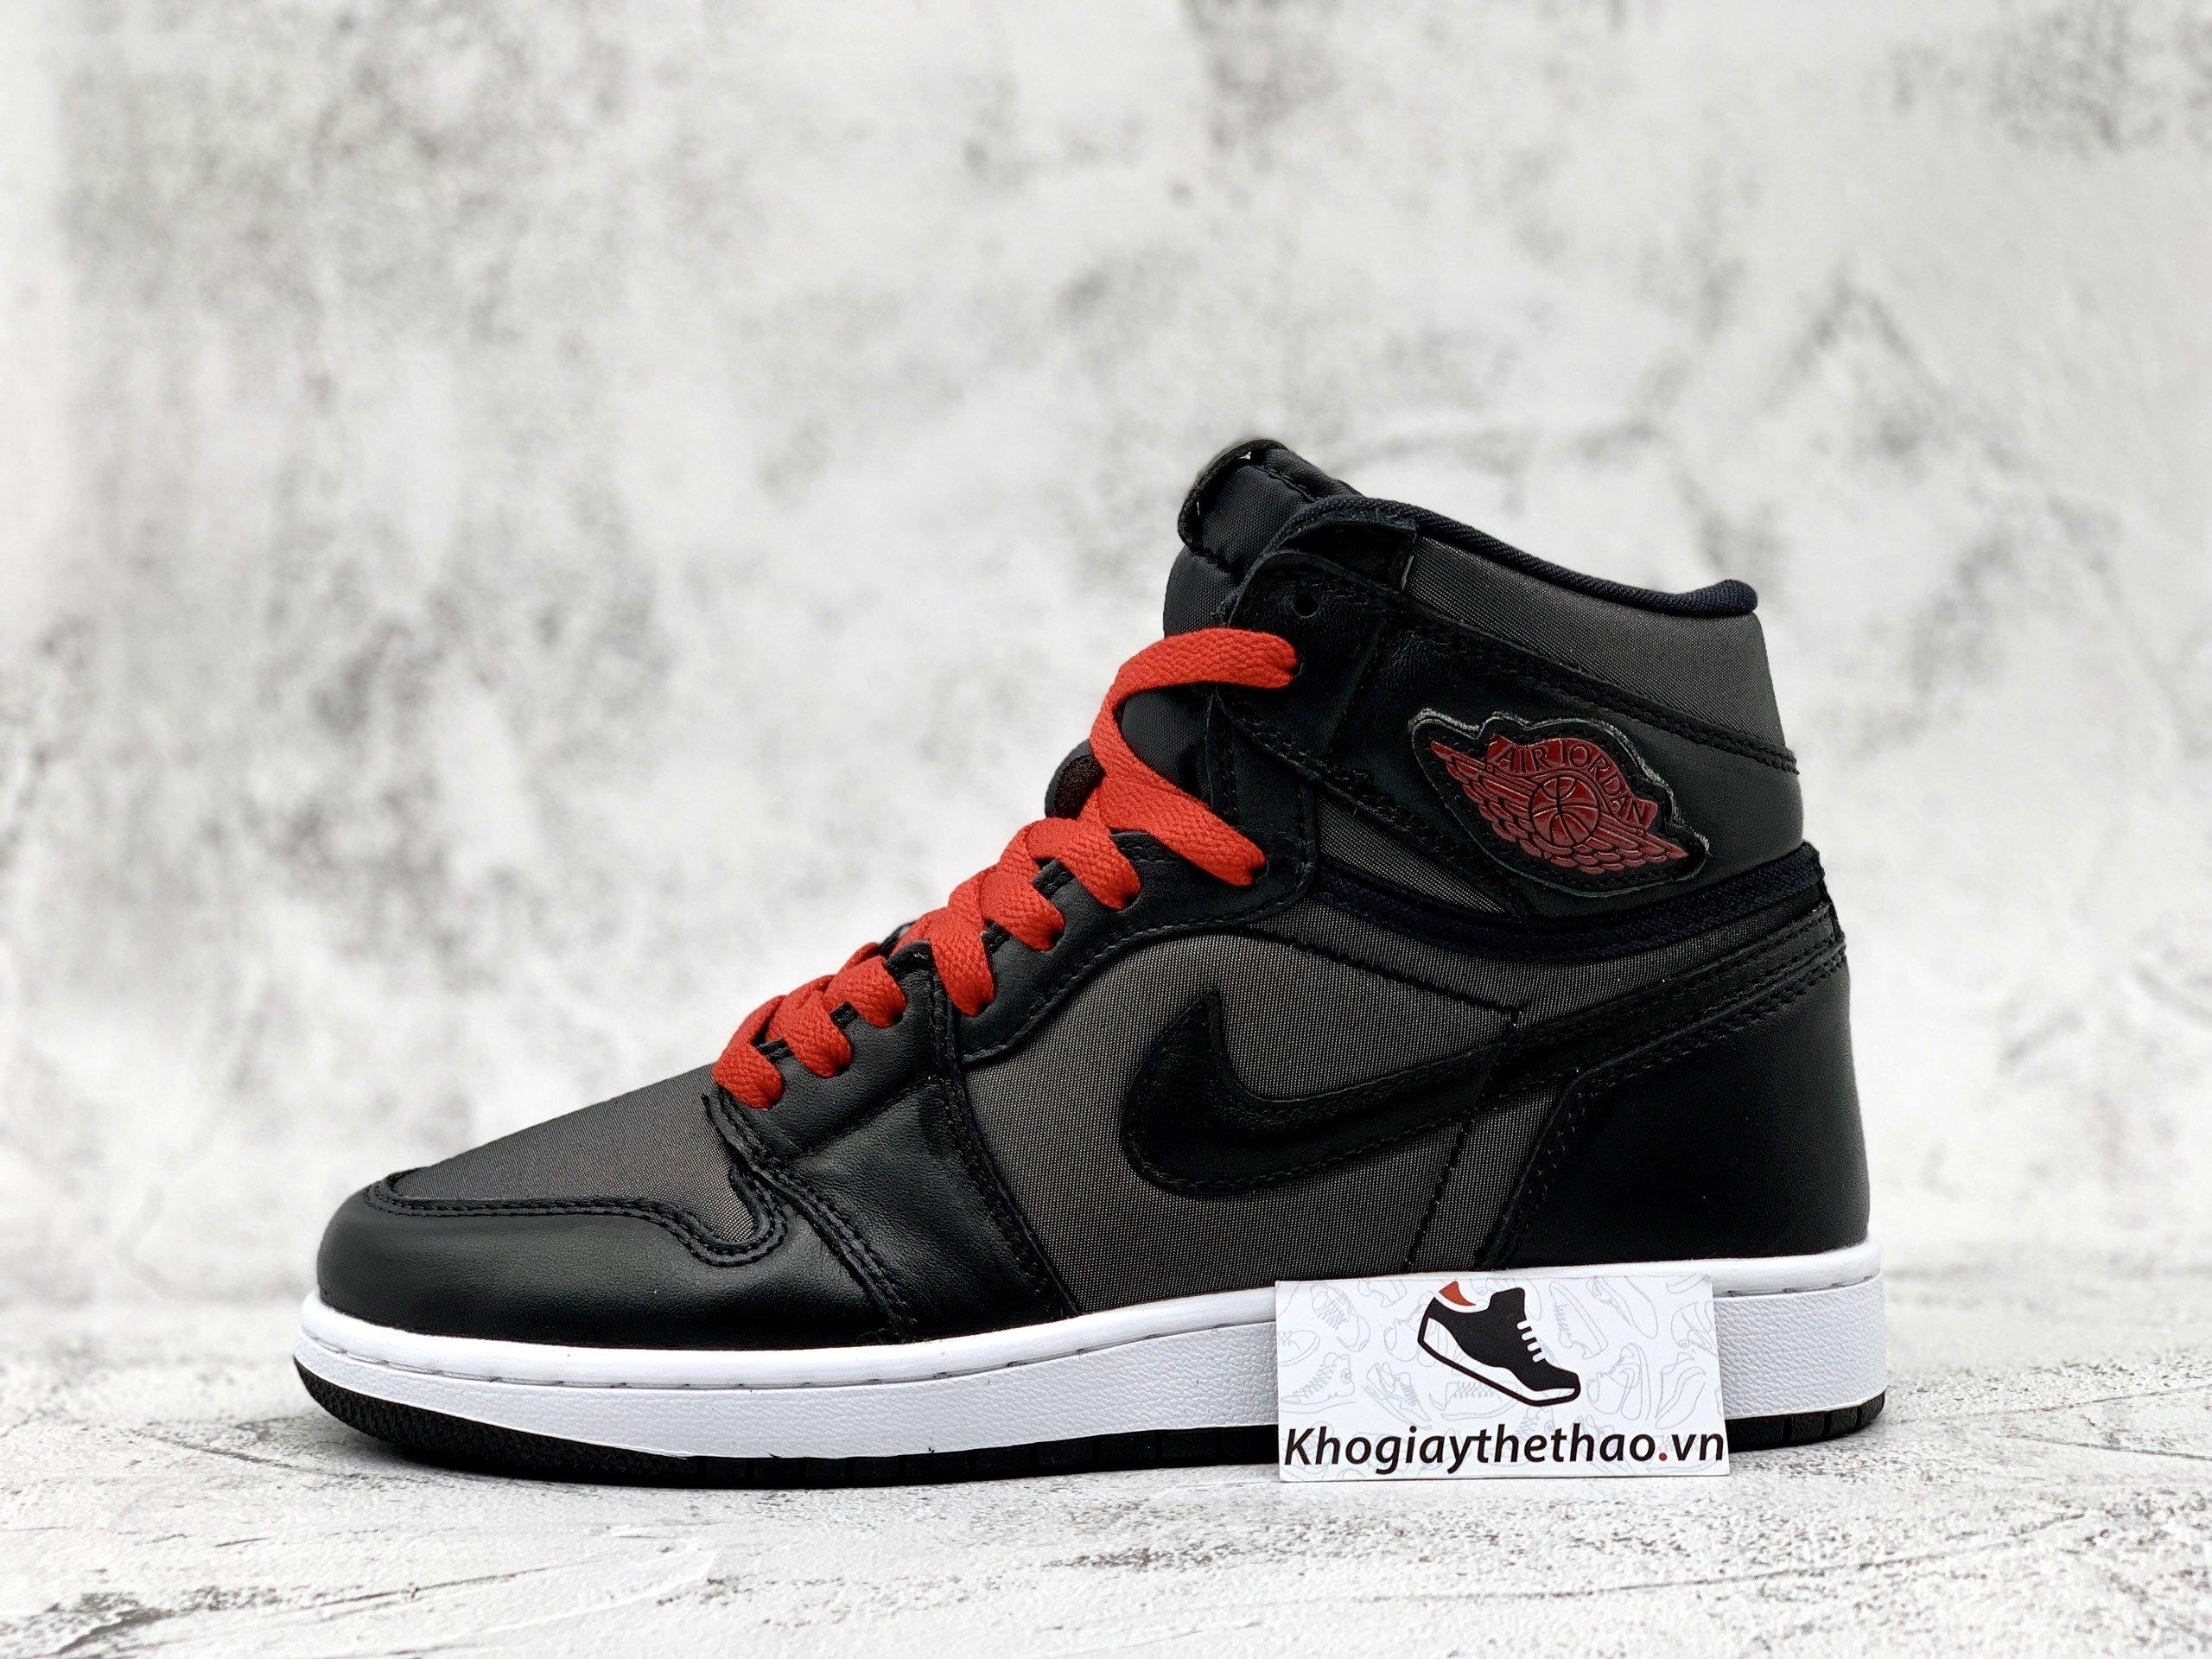 Giày Nike Air Jordan 1 Retro High Black Gym Red Black